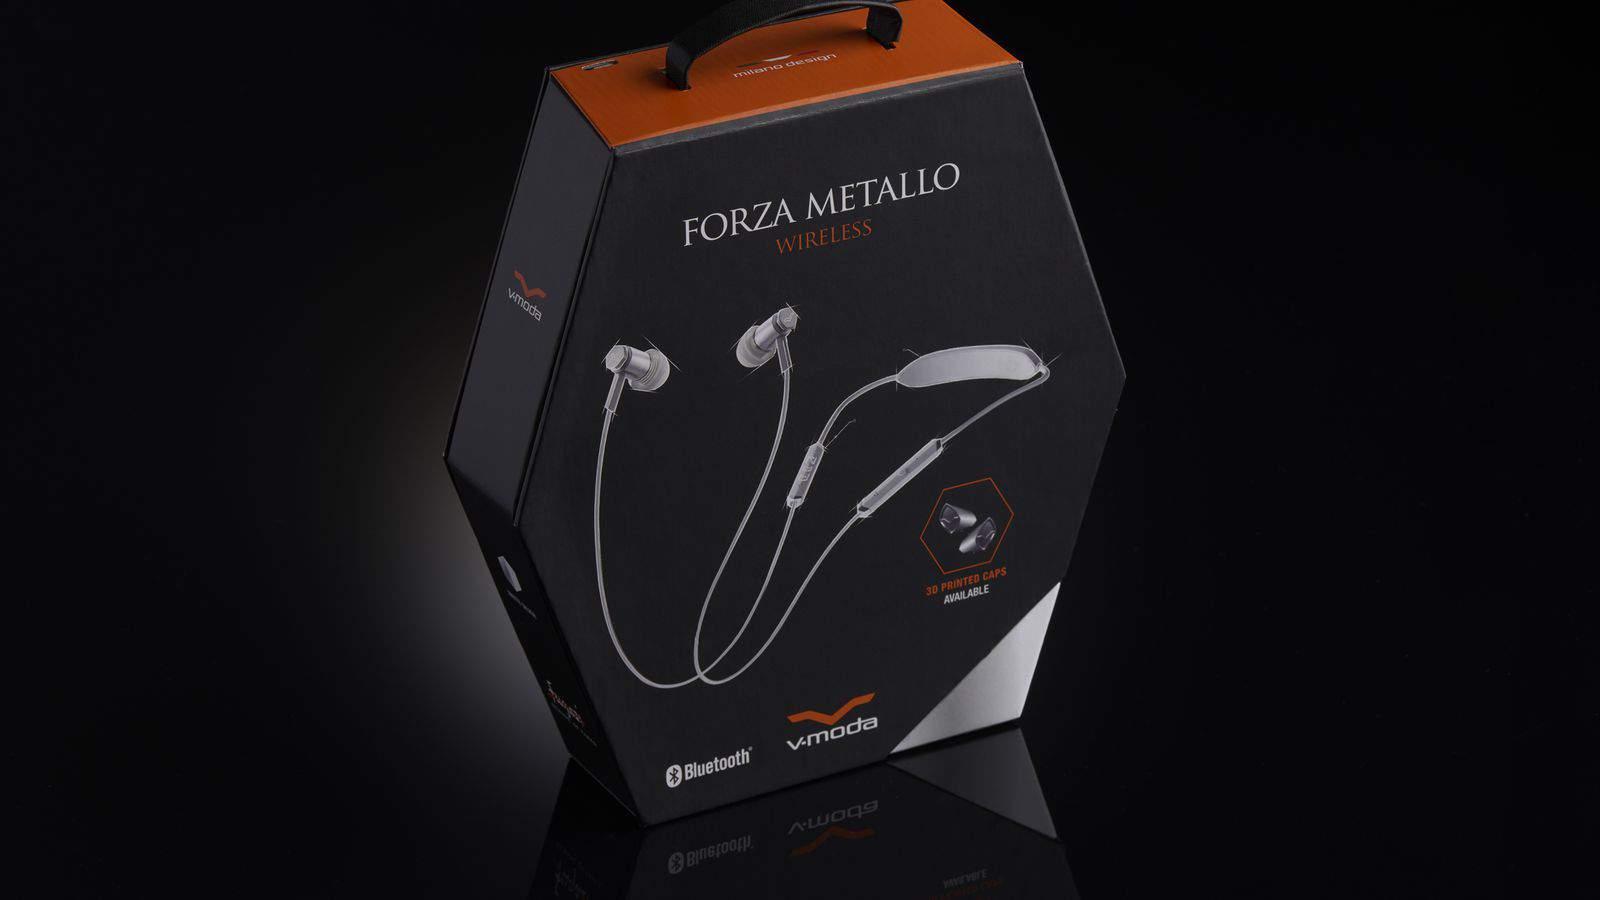 V-Moda Forza Metallo Wireless Bluetooth Earbuds